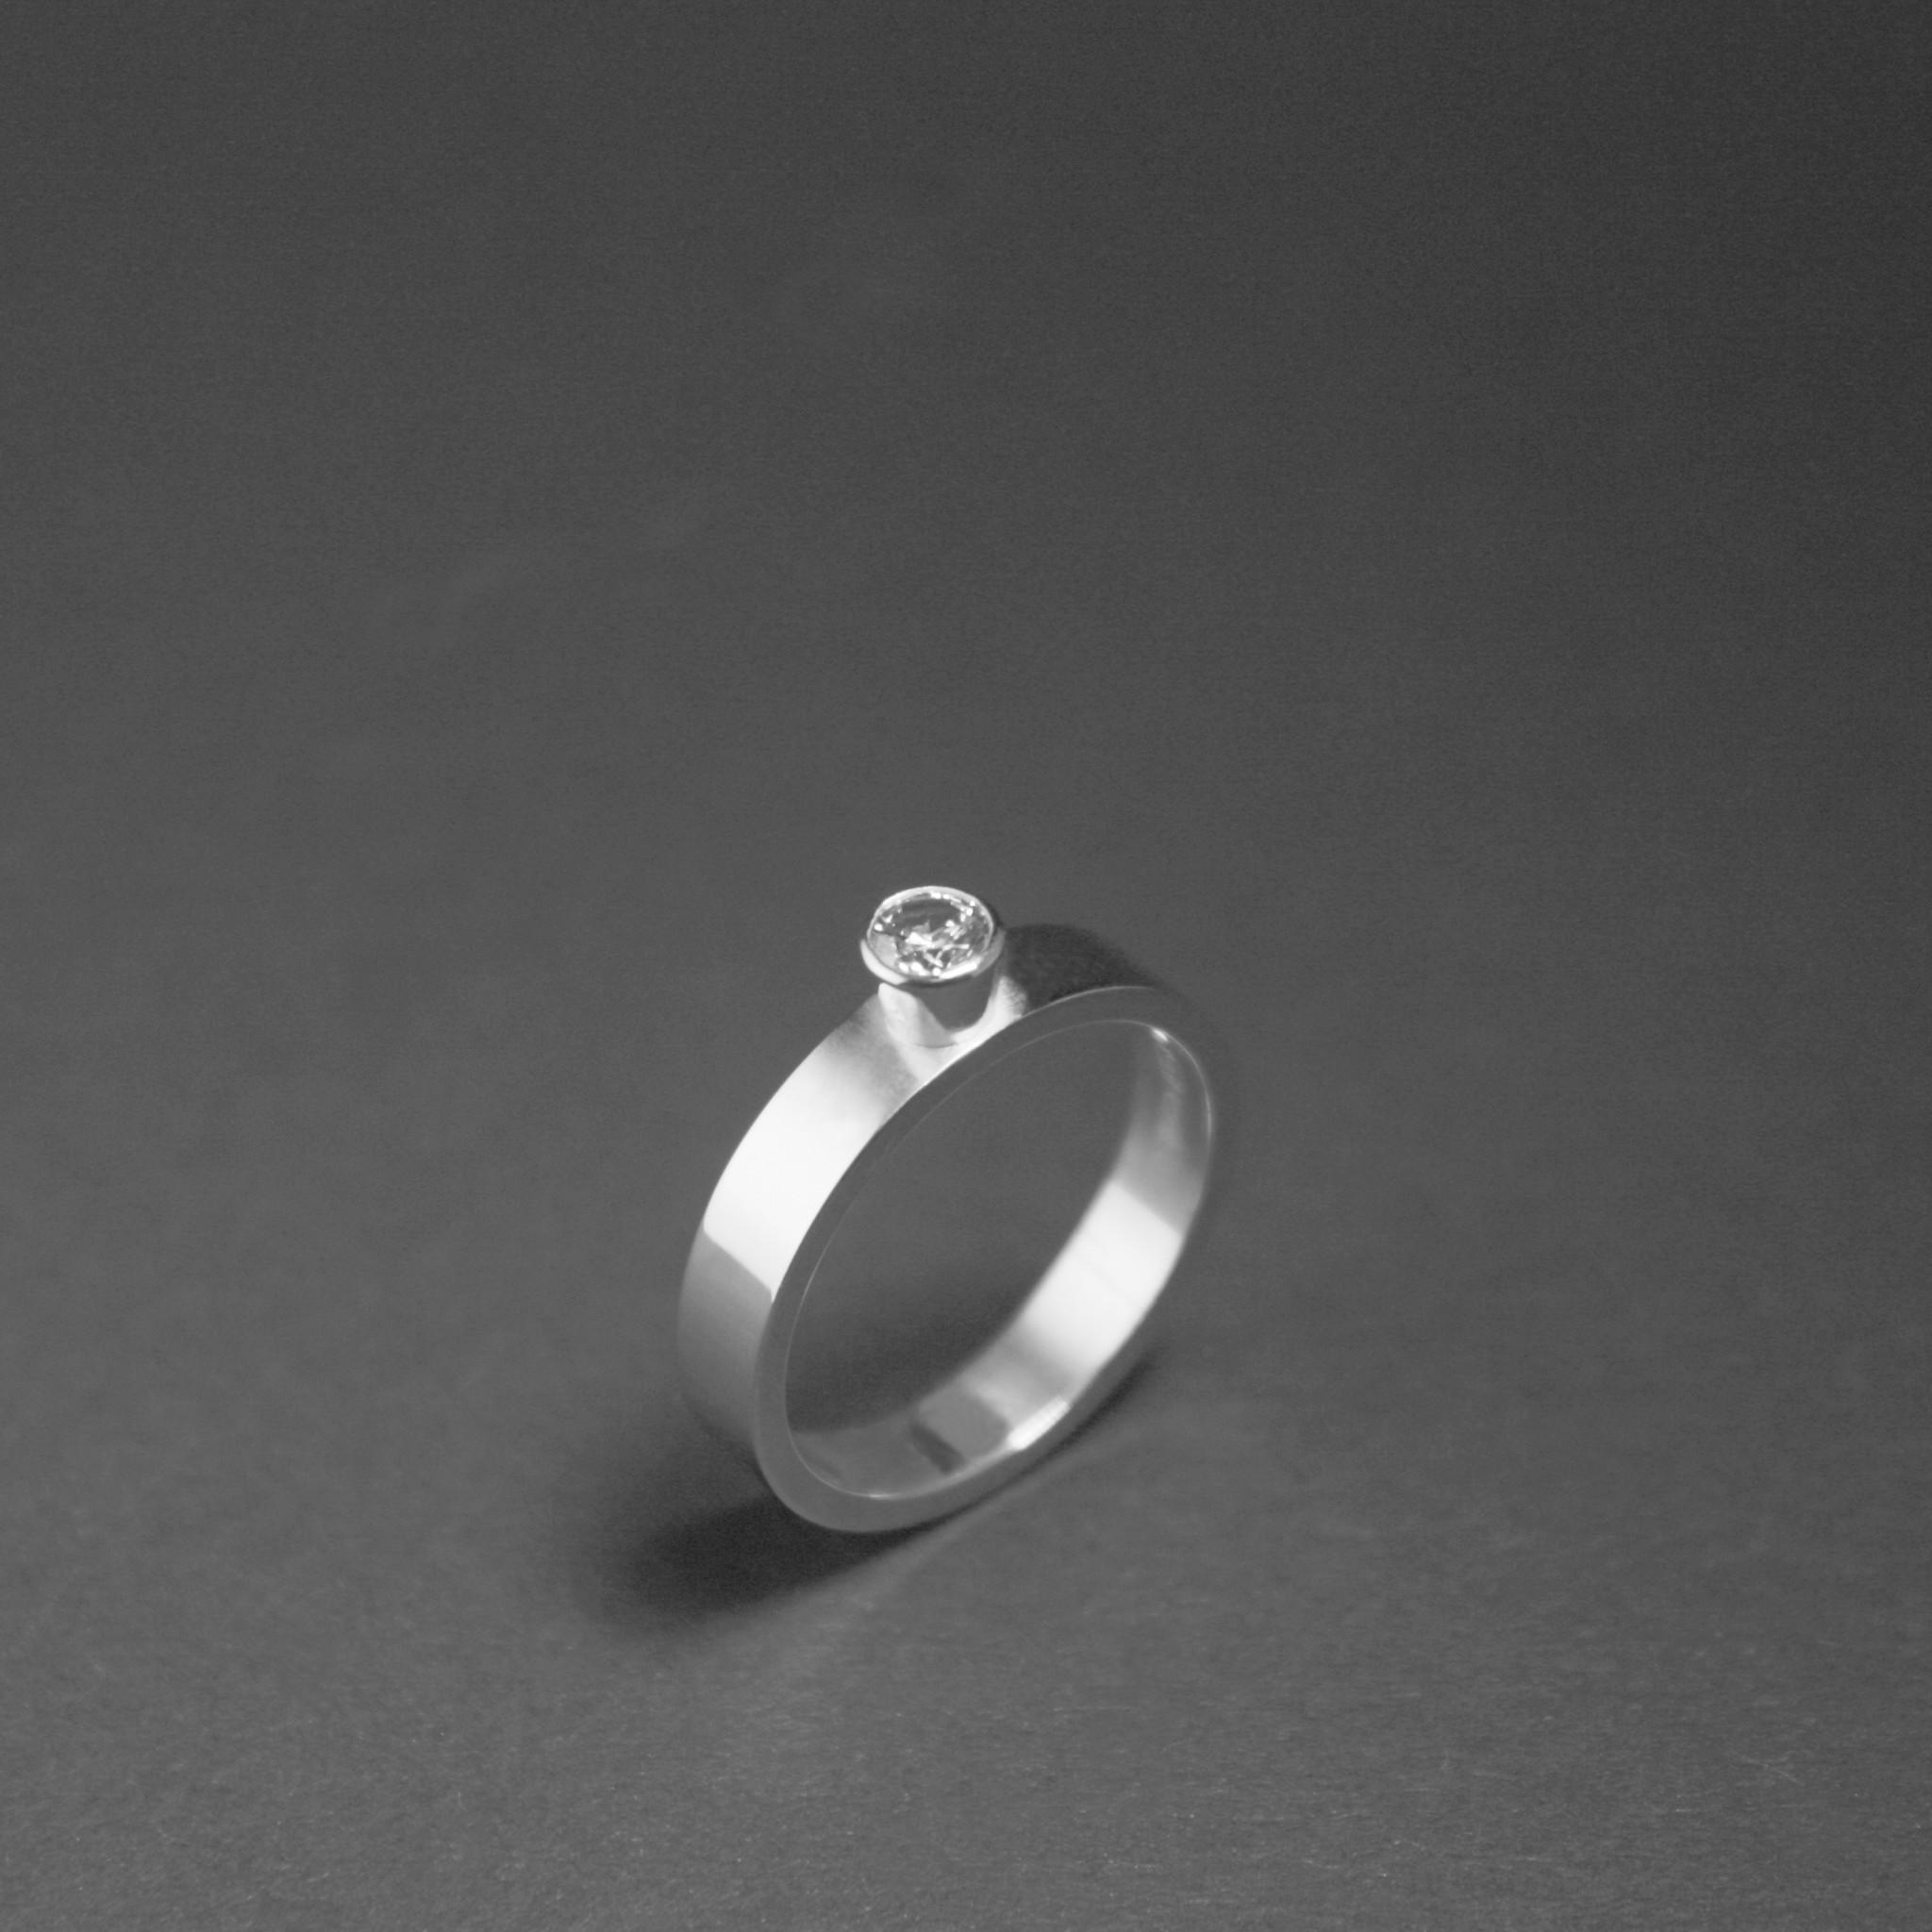 Ring WARE LIEFDE, zilver-4